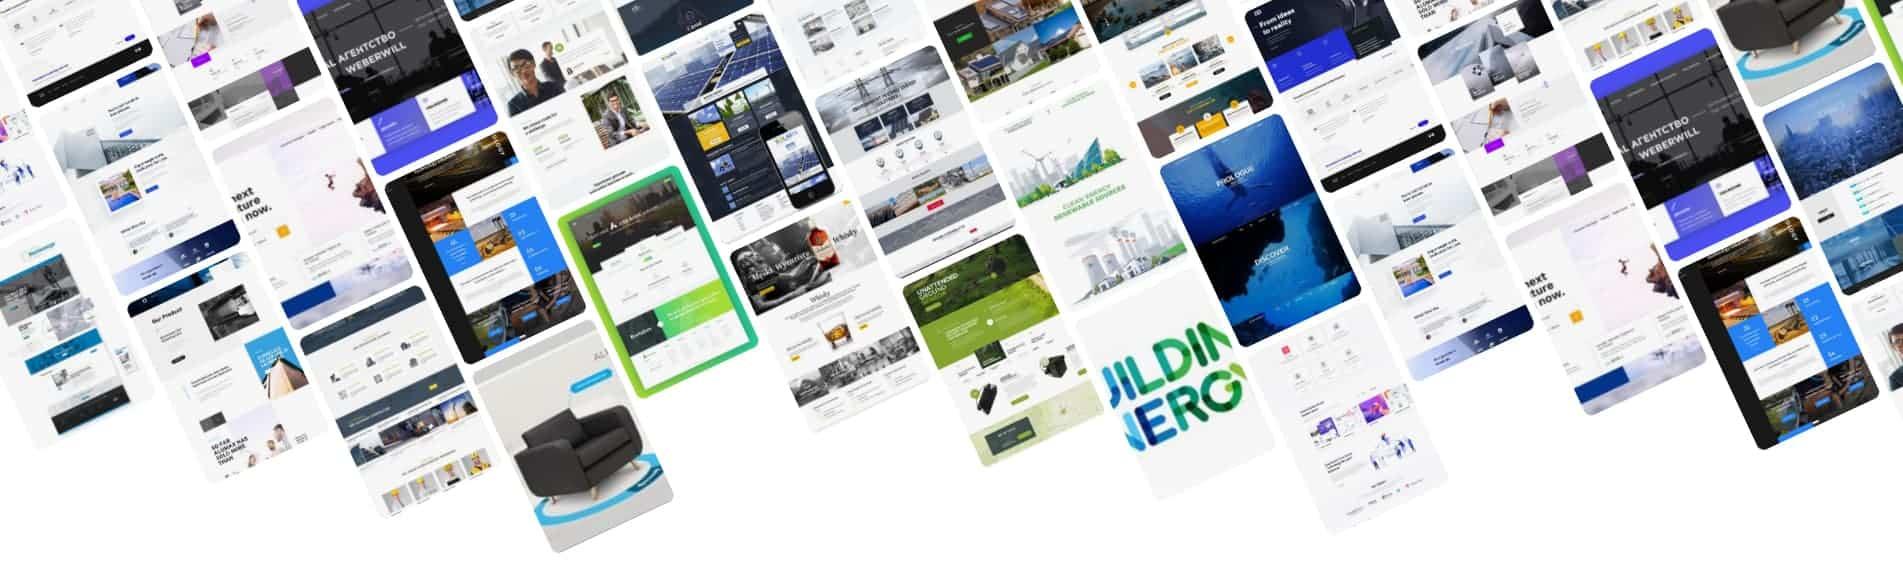 Web Design Idea 4700+ รายการ